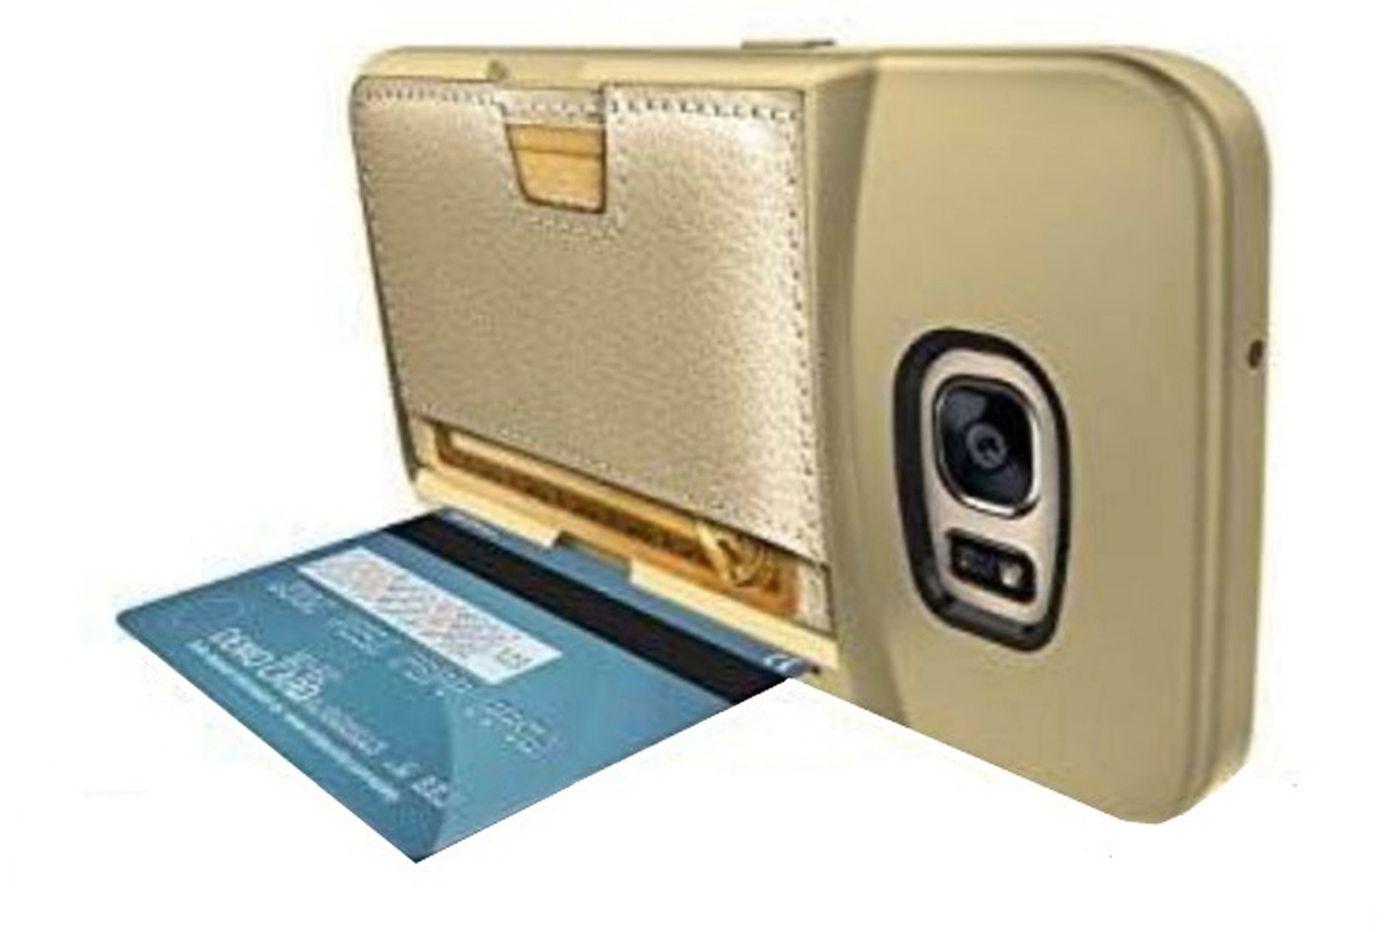 Travel Gear: Silk Wallet Slayer Vol. 2 Cell Phone Card Case